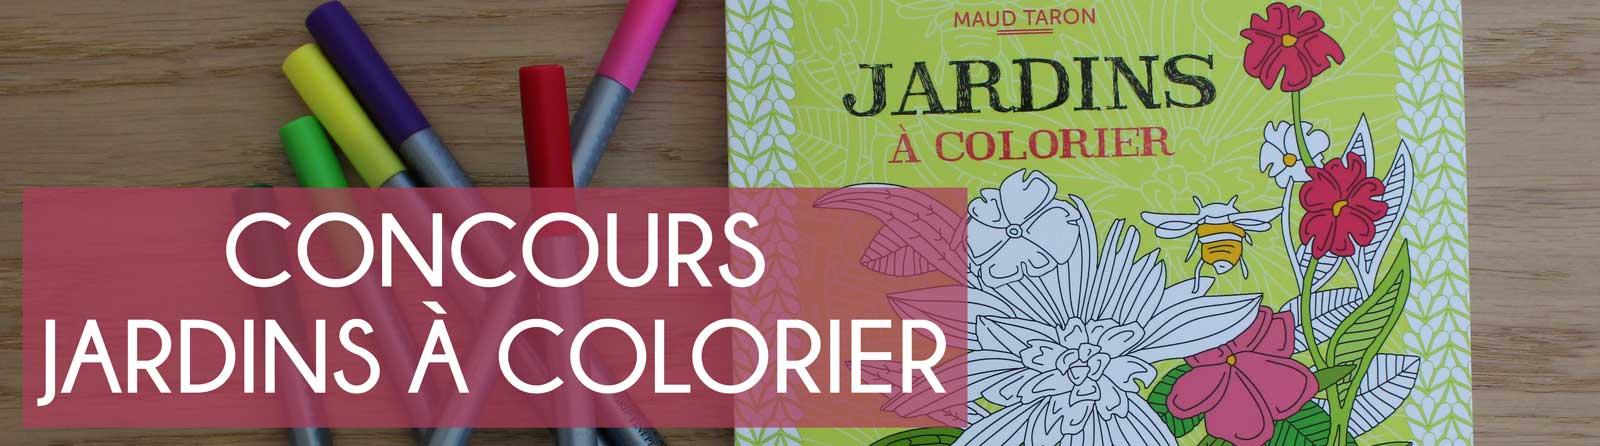 concours-jardins-a-colorier-maud-taron